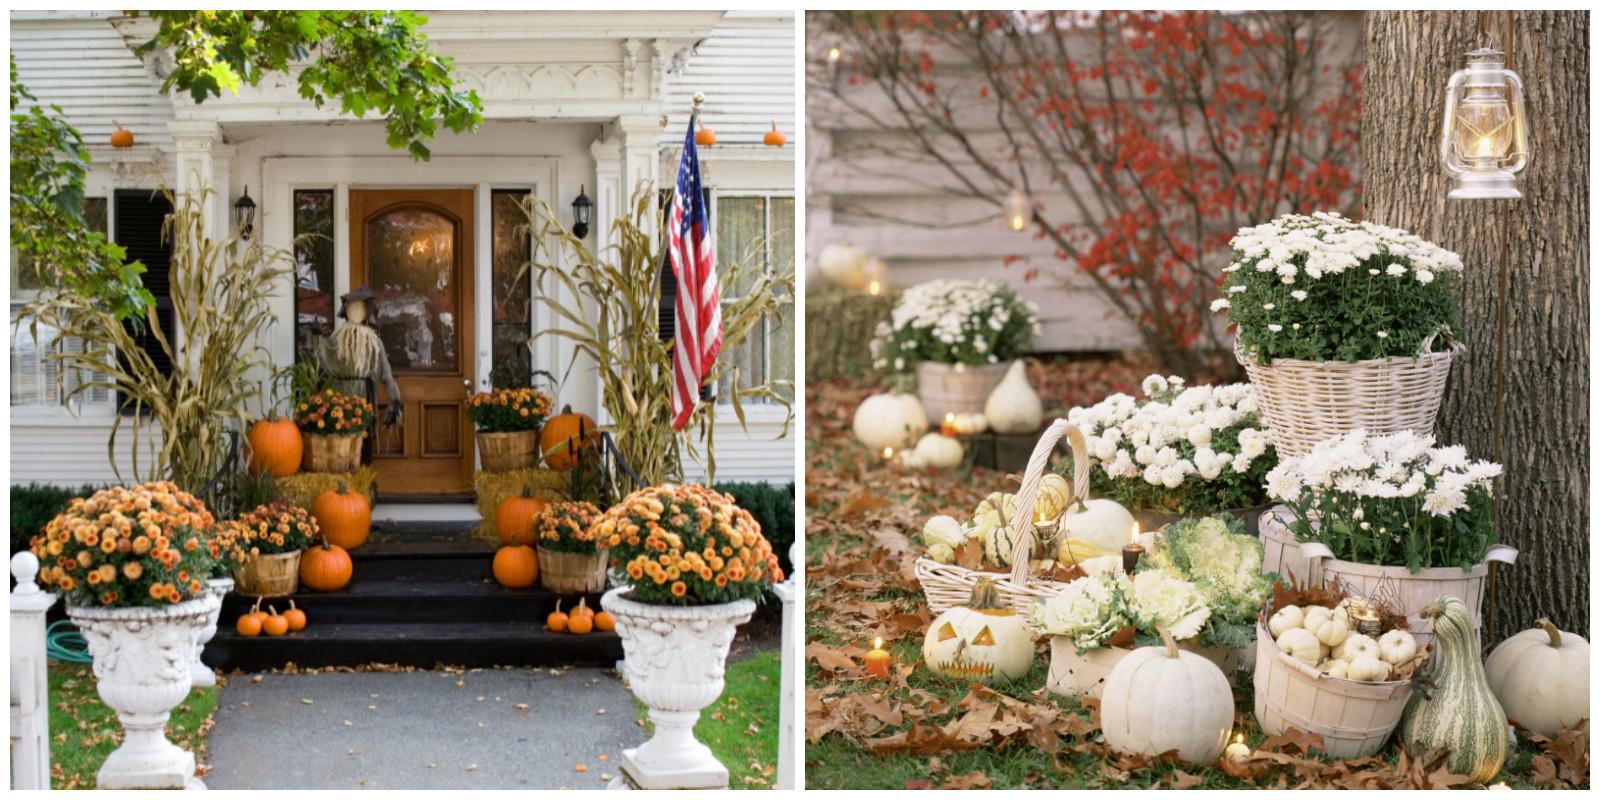 Porch Halloween Decor  25 Outdoor Halloween Decorations Porch Decorating Ideas